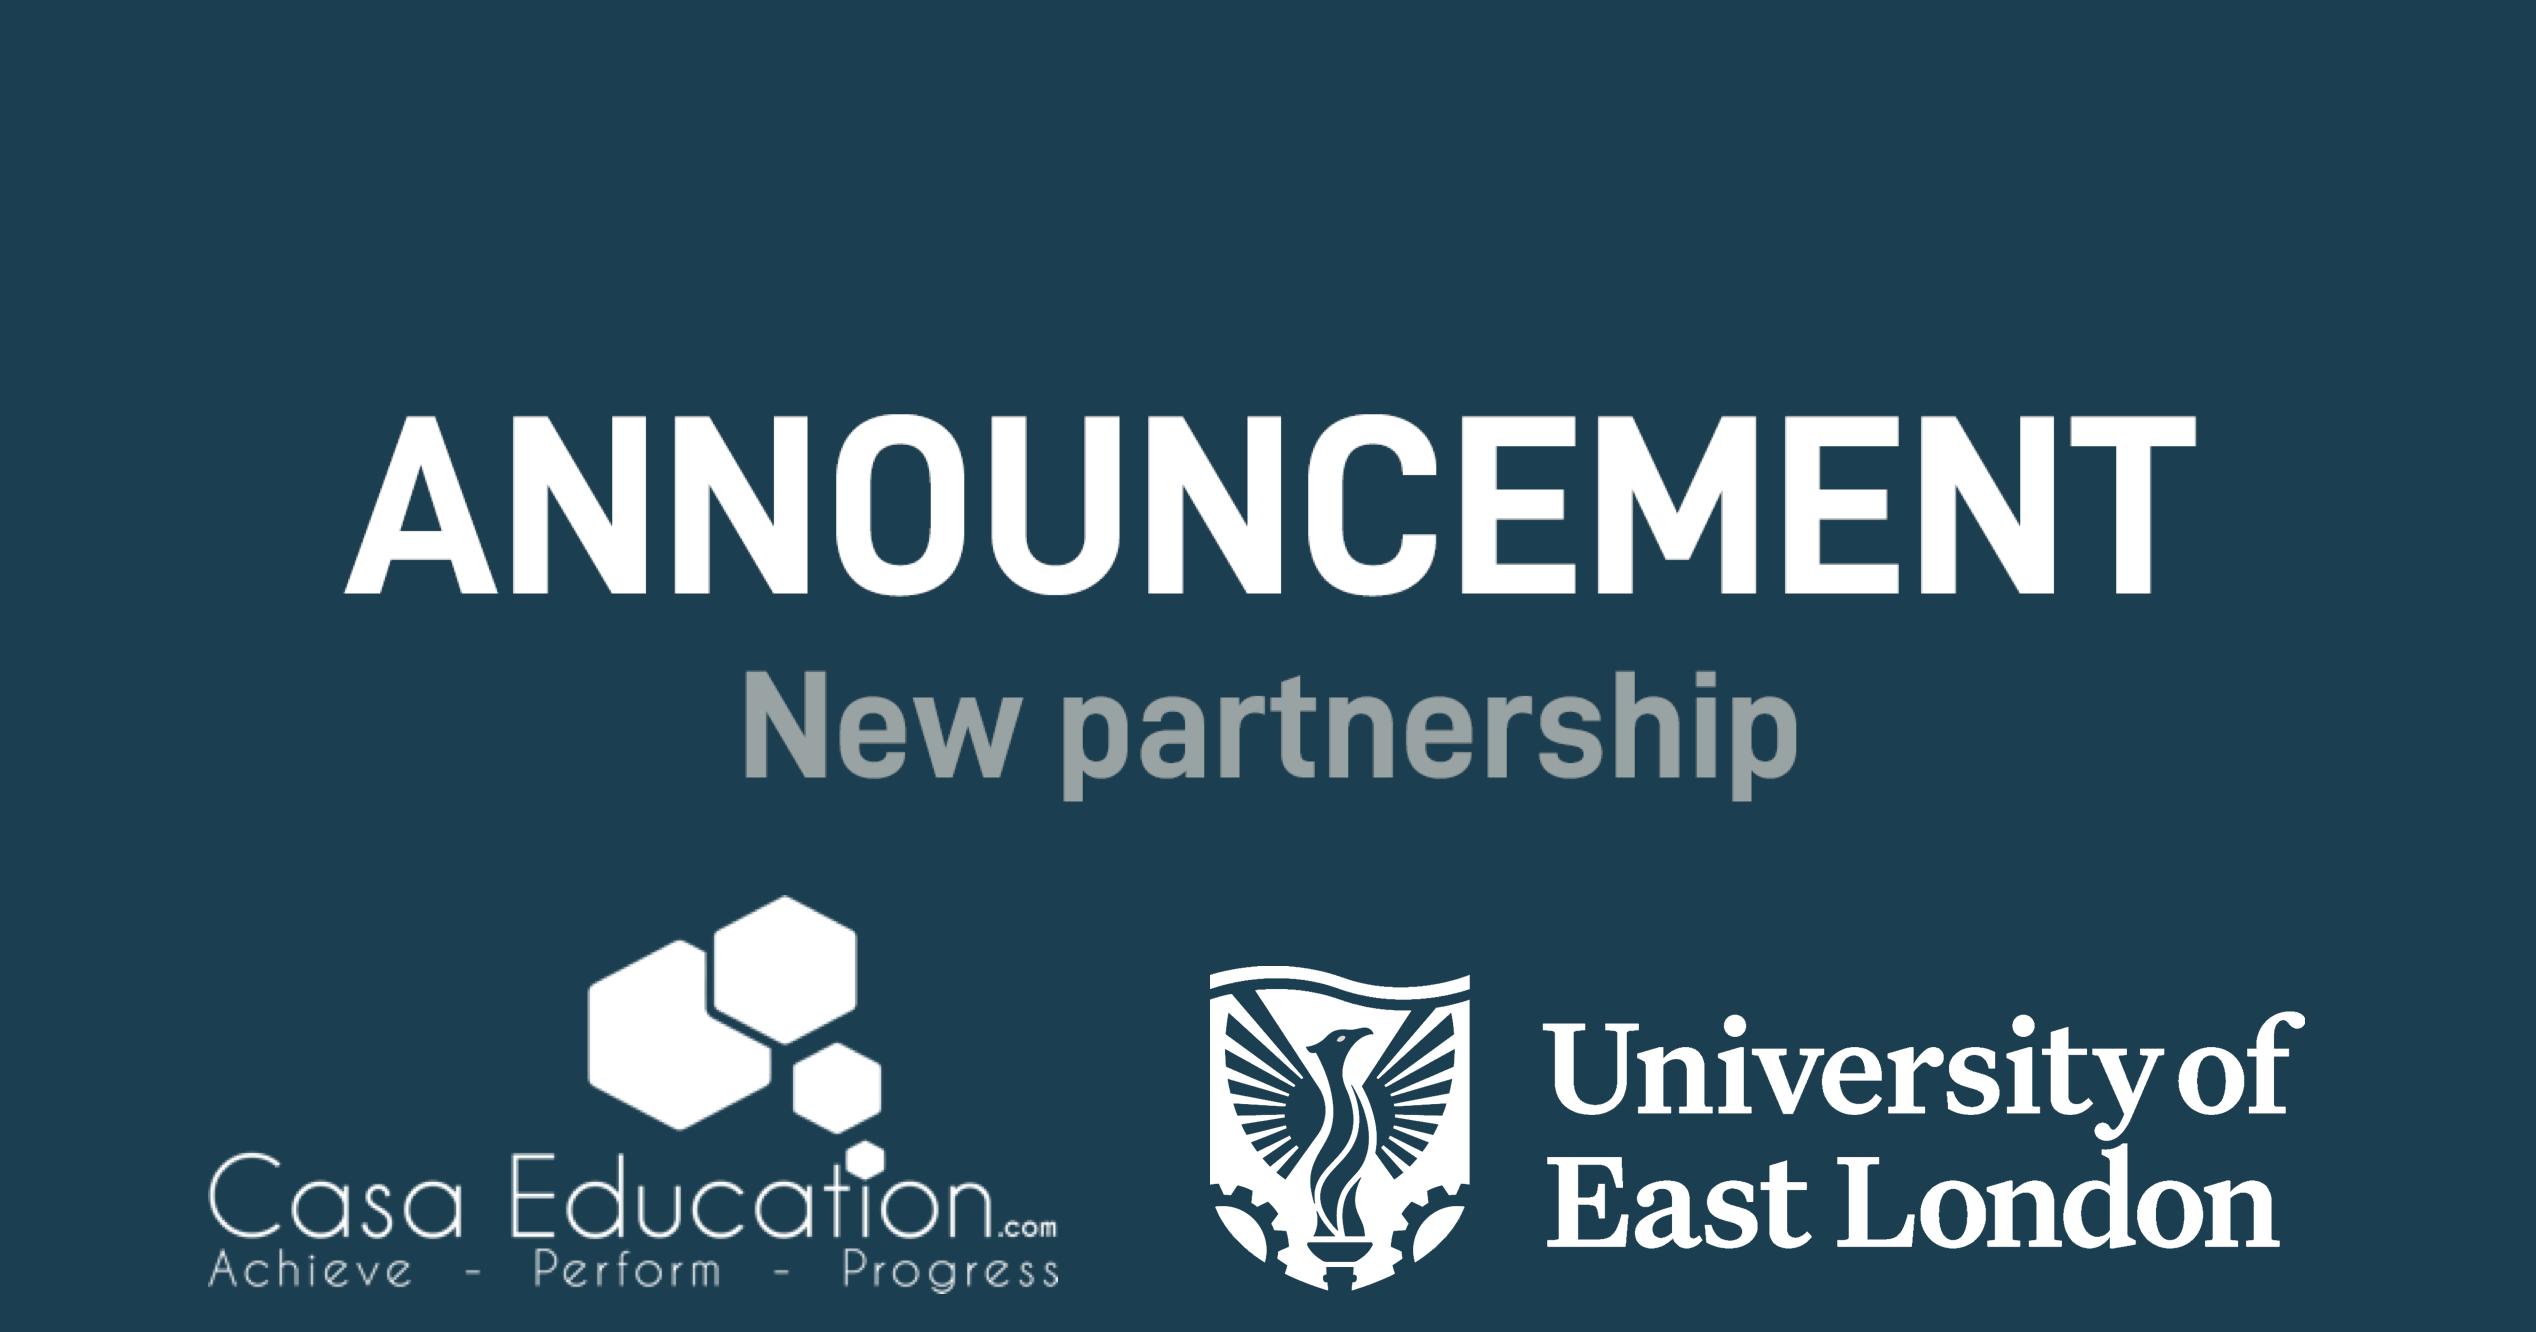 Partnership CasaEducation UEL